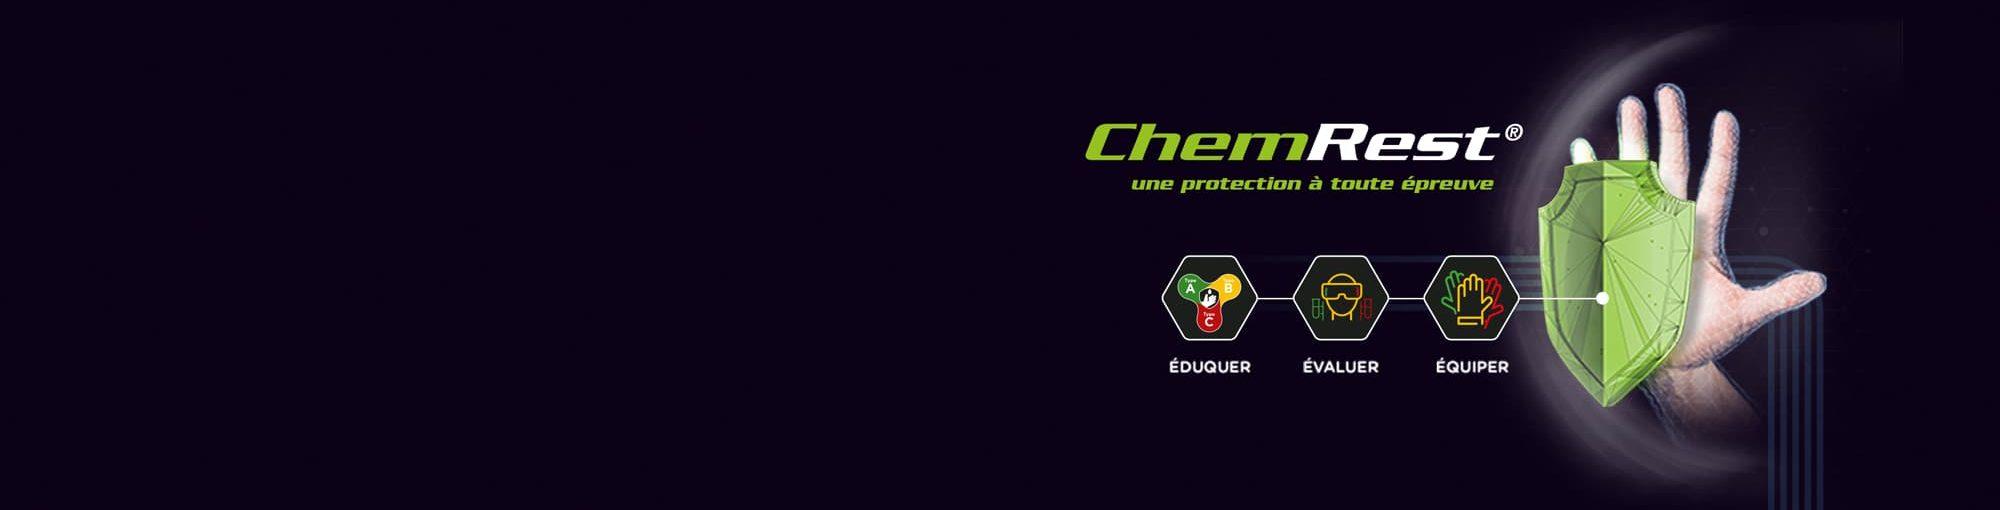 Showa_Chemrest_banner_homepage_v1.0_FR